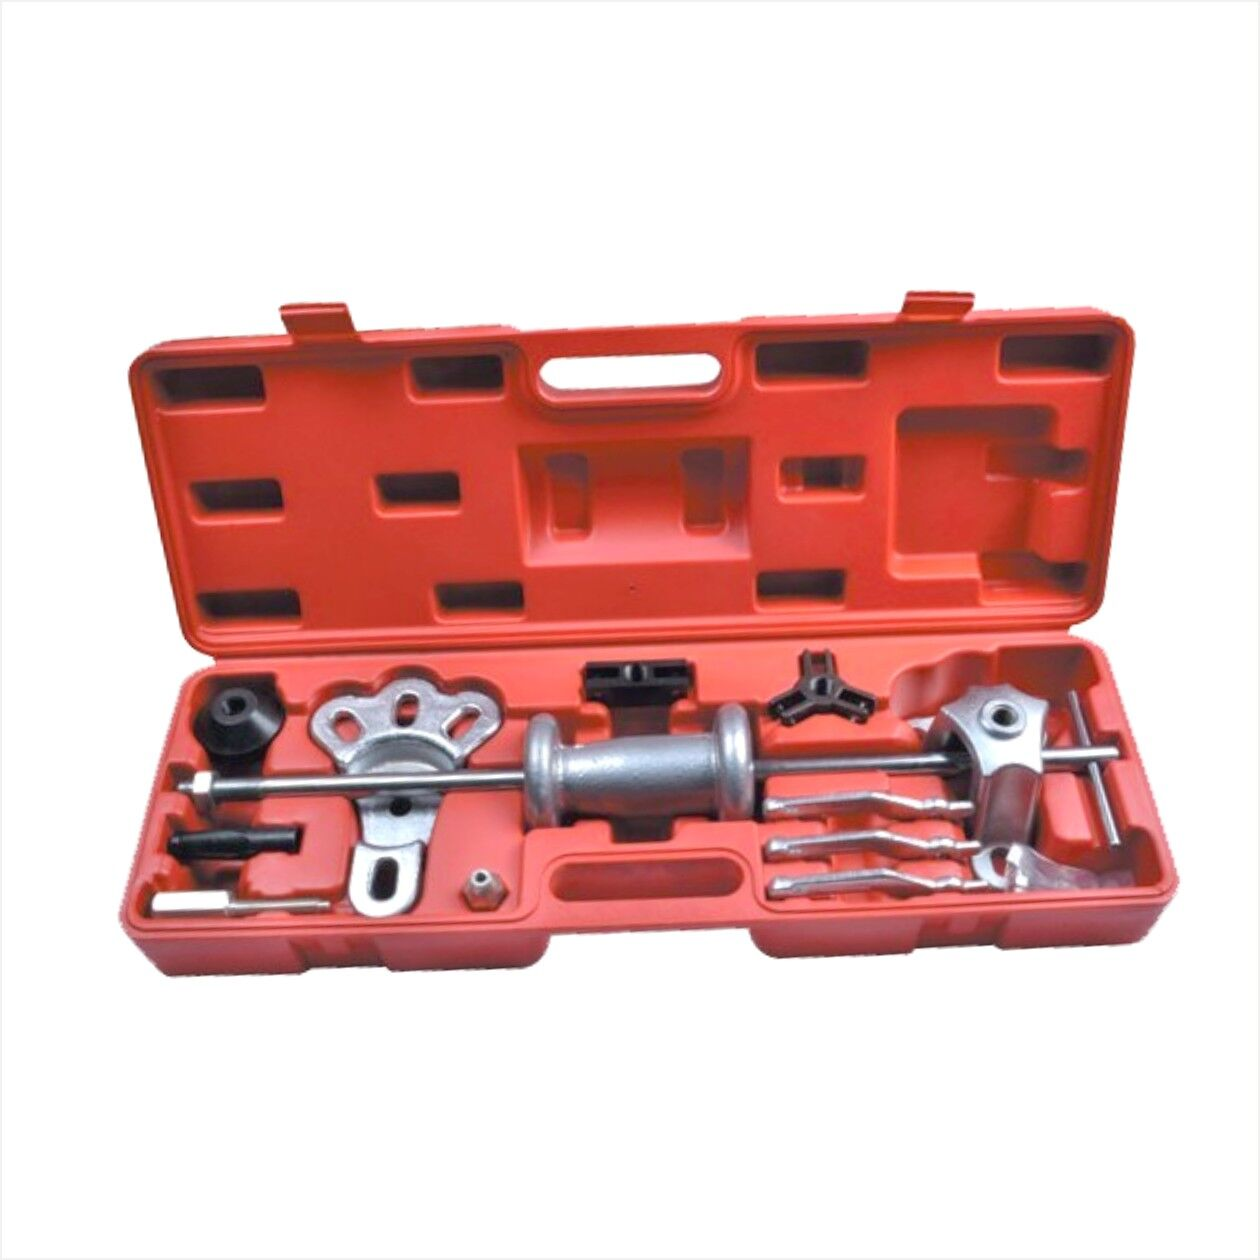 Axles Slide Hammer Puller Set 2/3 Jaw Internal/External Puller Bearing Remover Tool